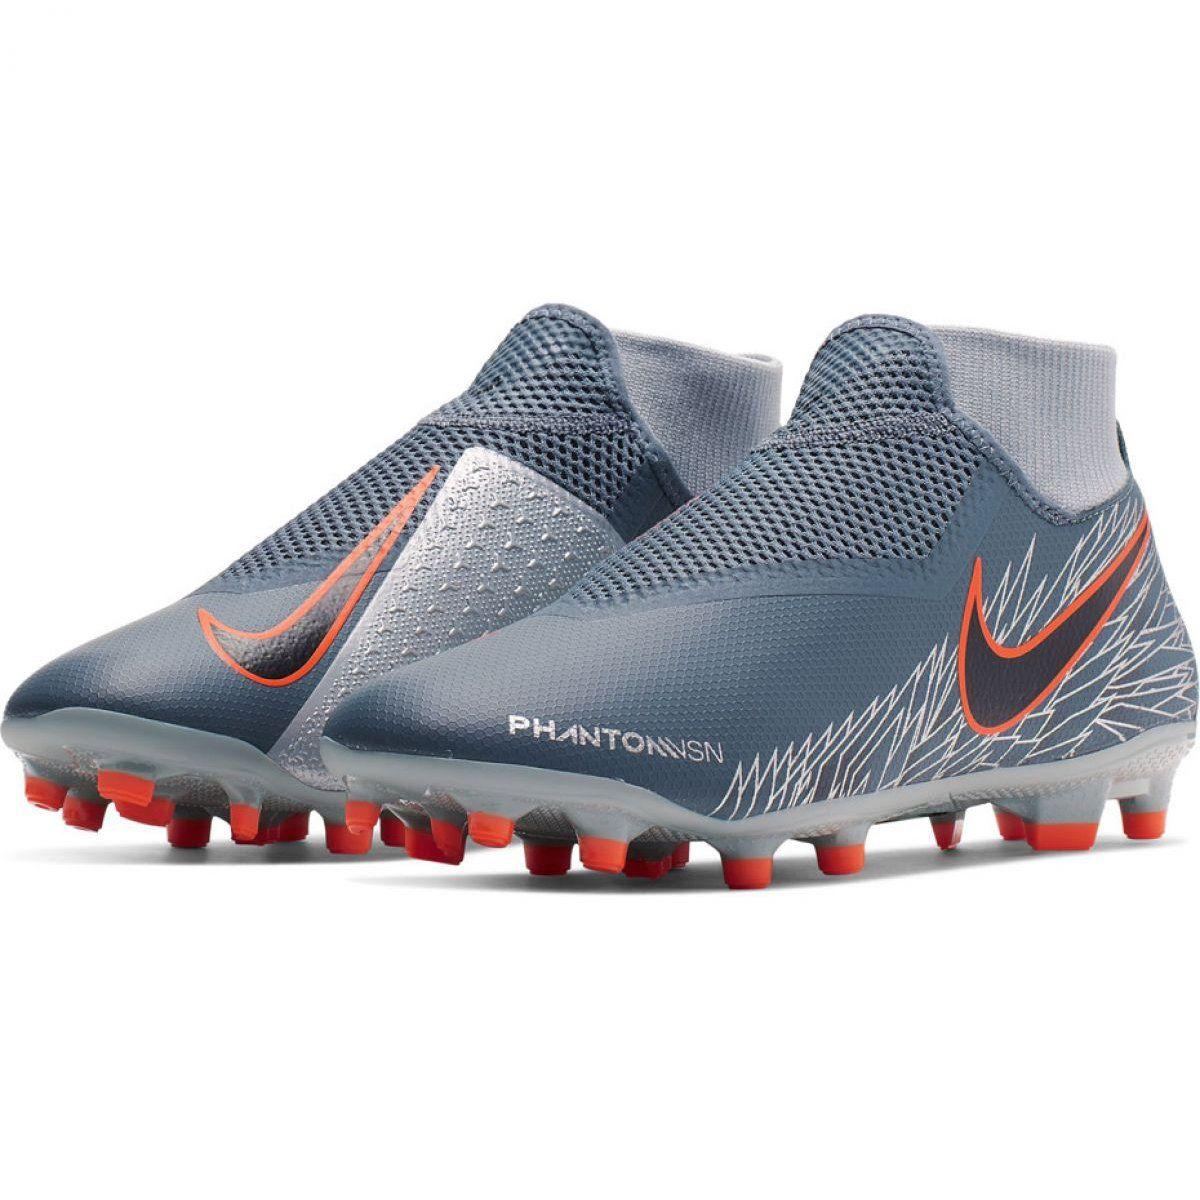 Buty Pilkarskie Nike Phantom Vsn Academy Df Fg Mg M Ao3258 408 Wielokolorowe Szare Football Shoes Shoes Nike Football